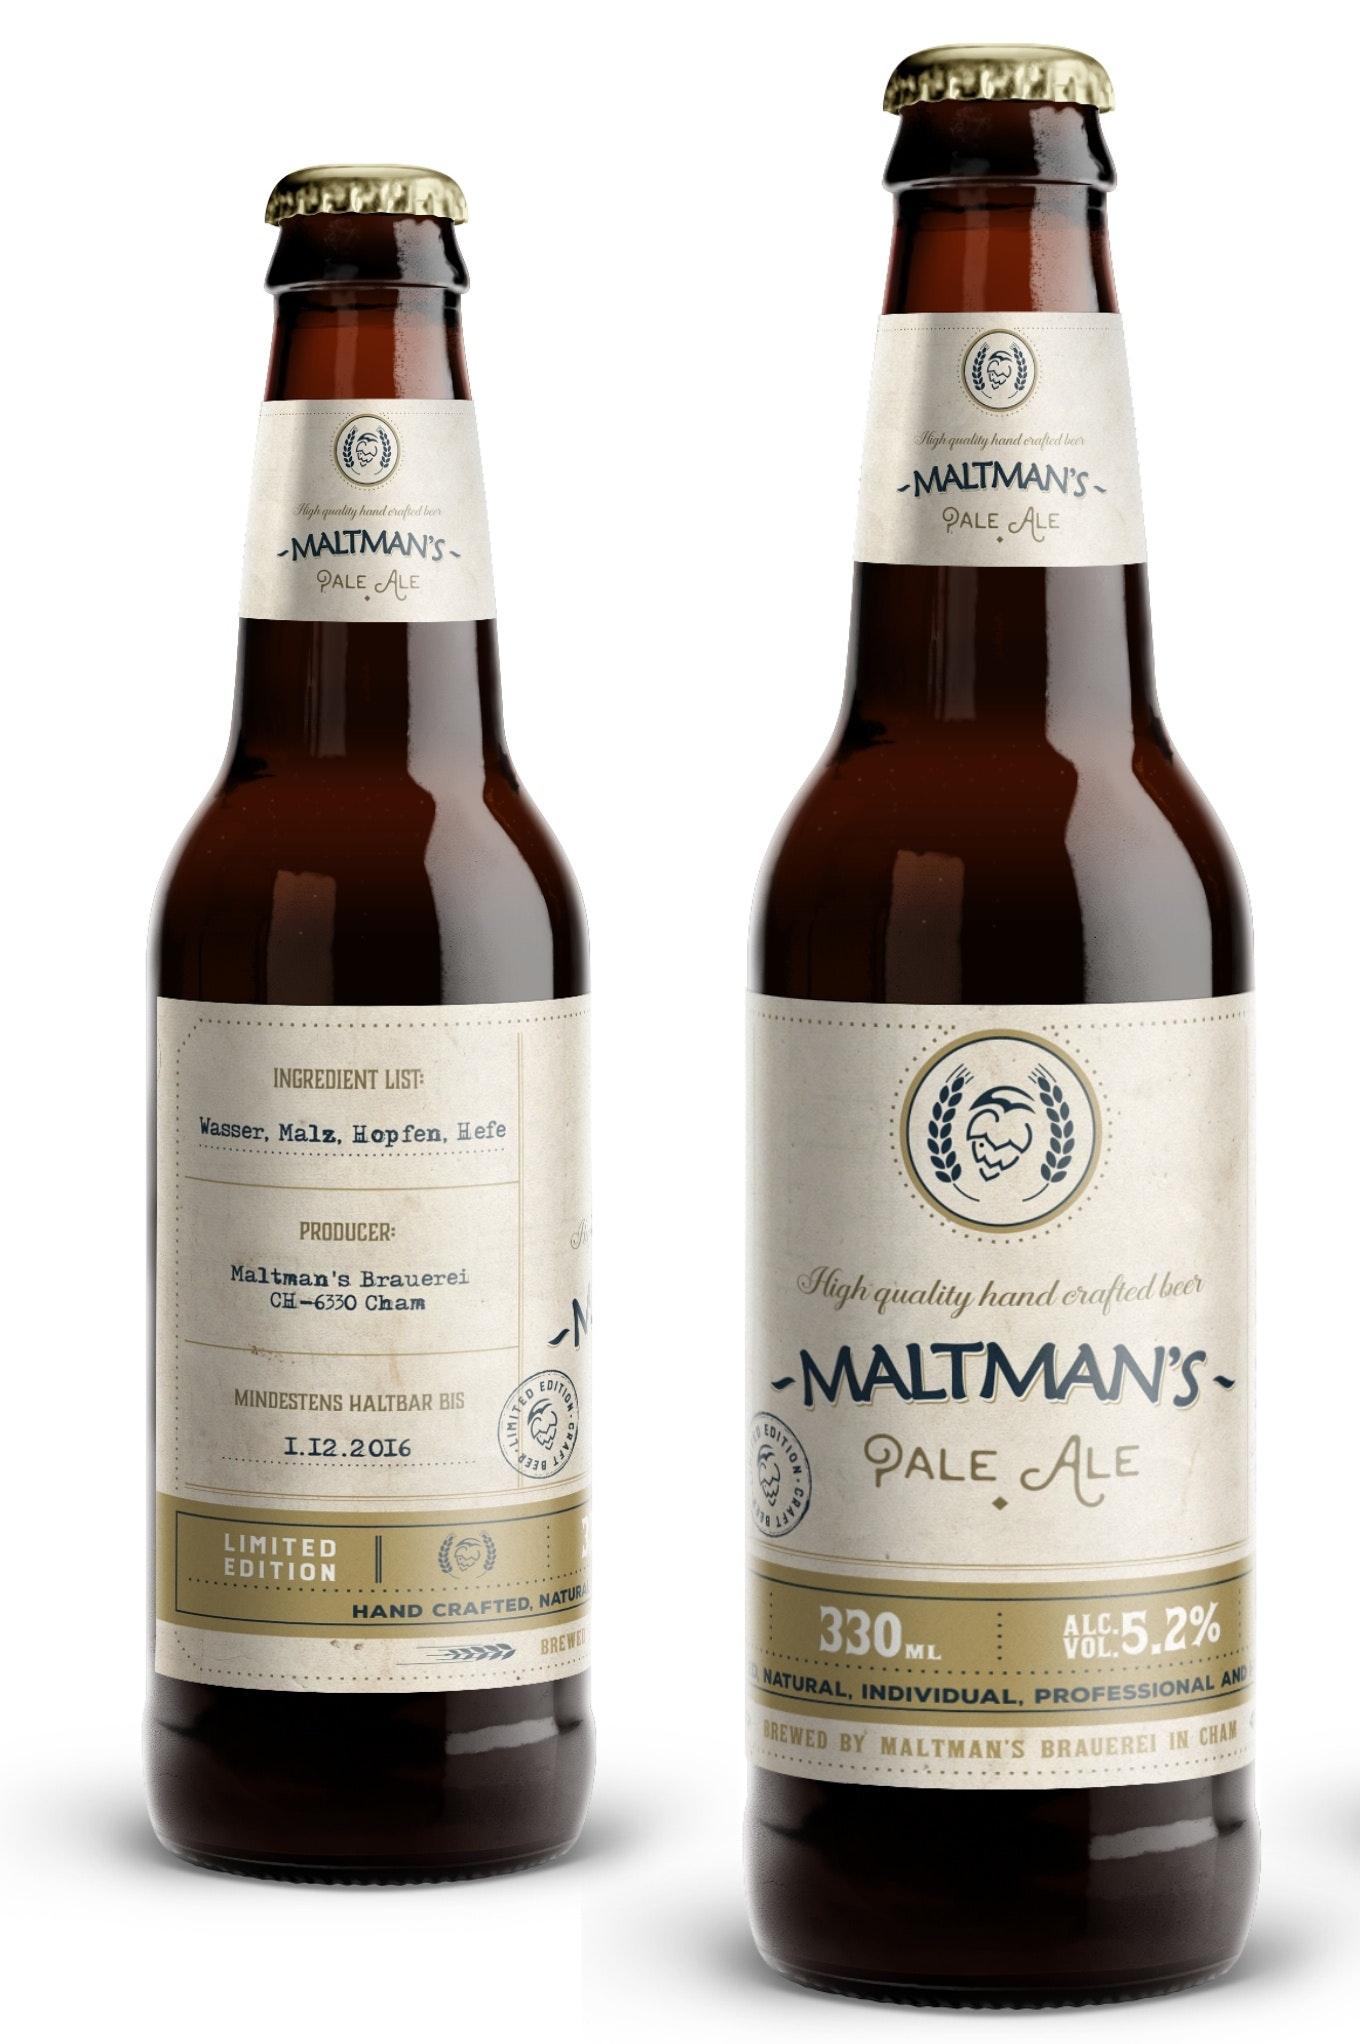 Maltman's Pale Ale Beer Label